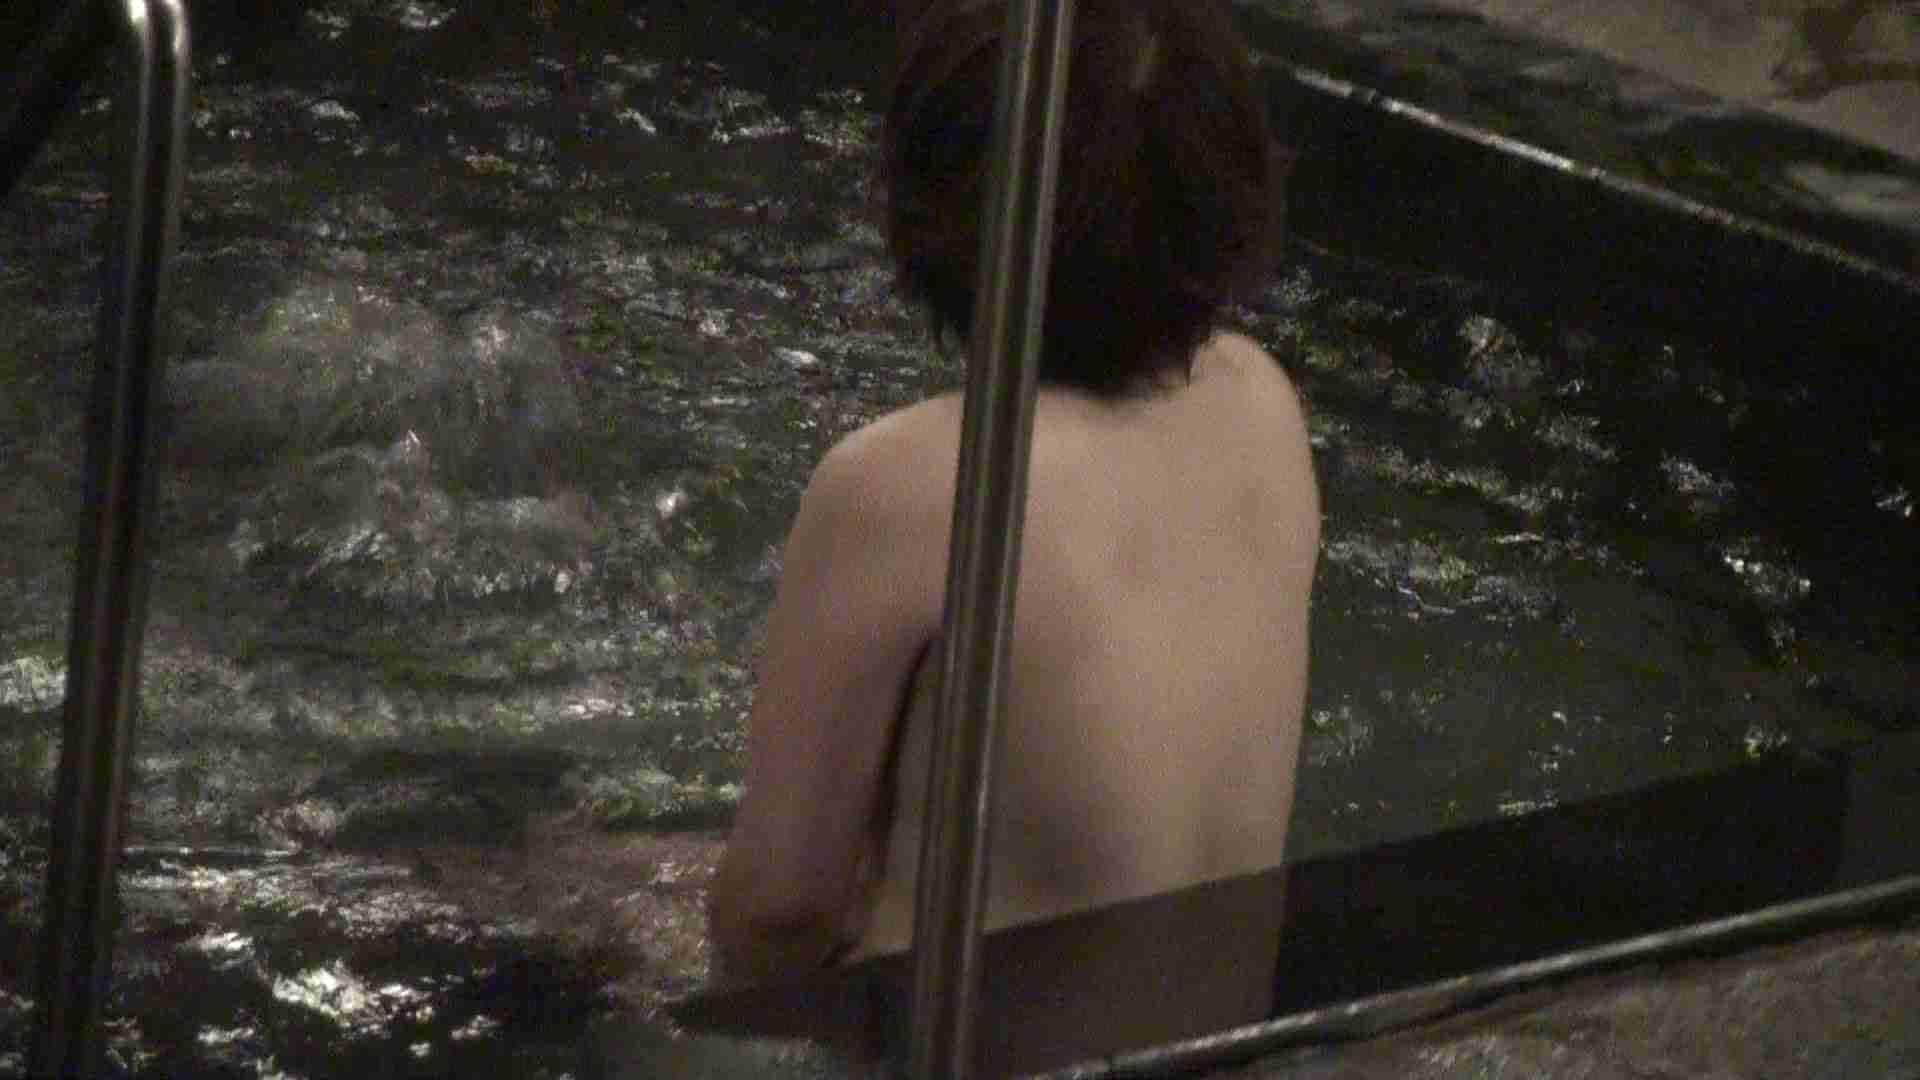 Aquaな露天風呂Vol.432 露天 アダルト動画キャプチャ 86PICs 32